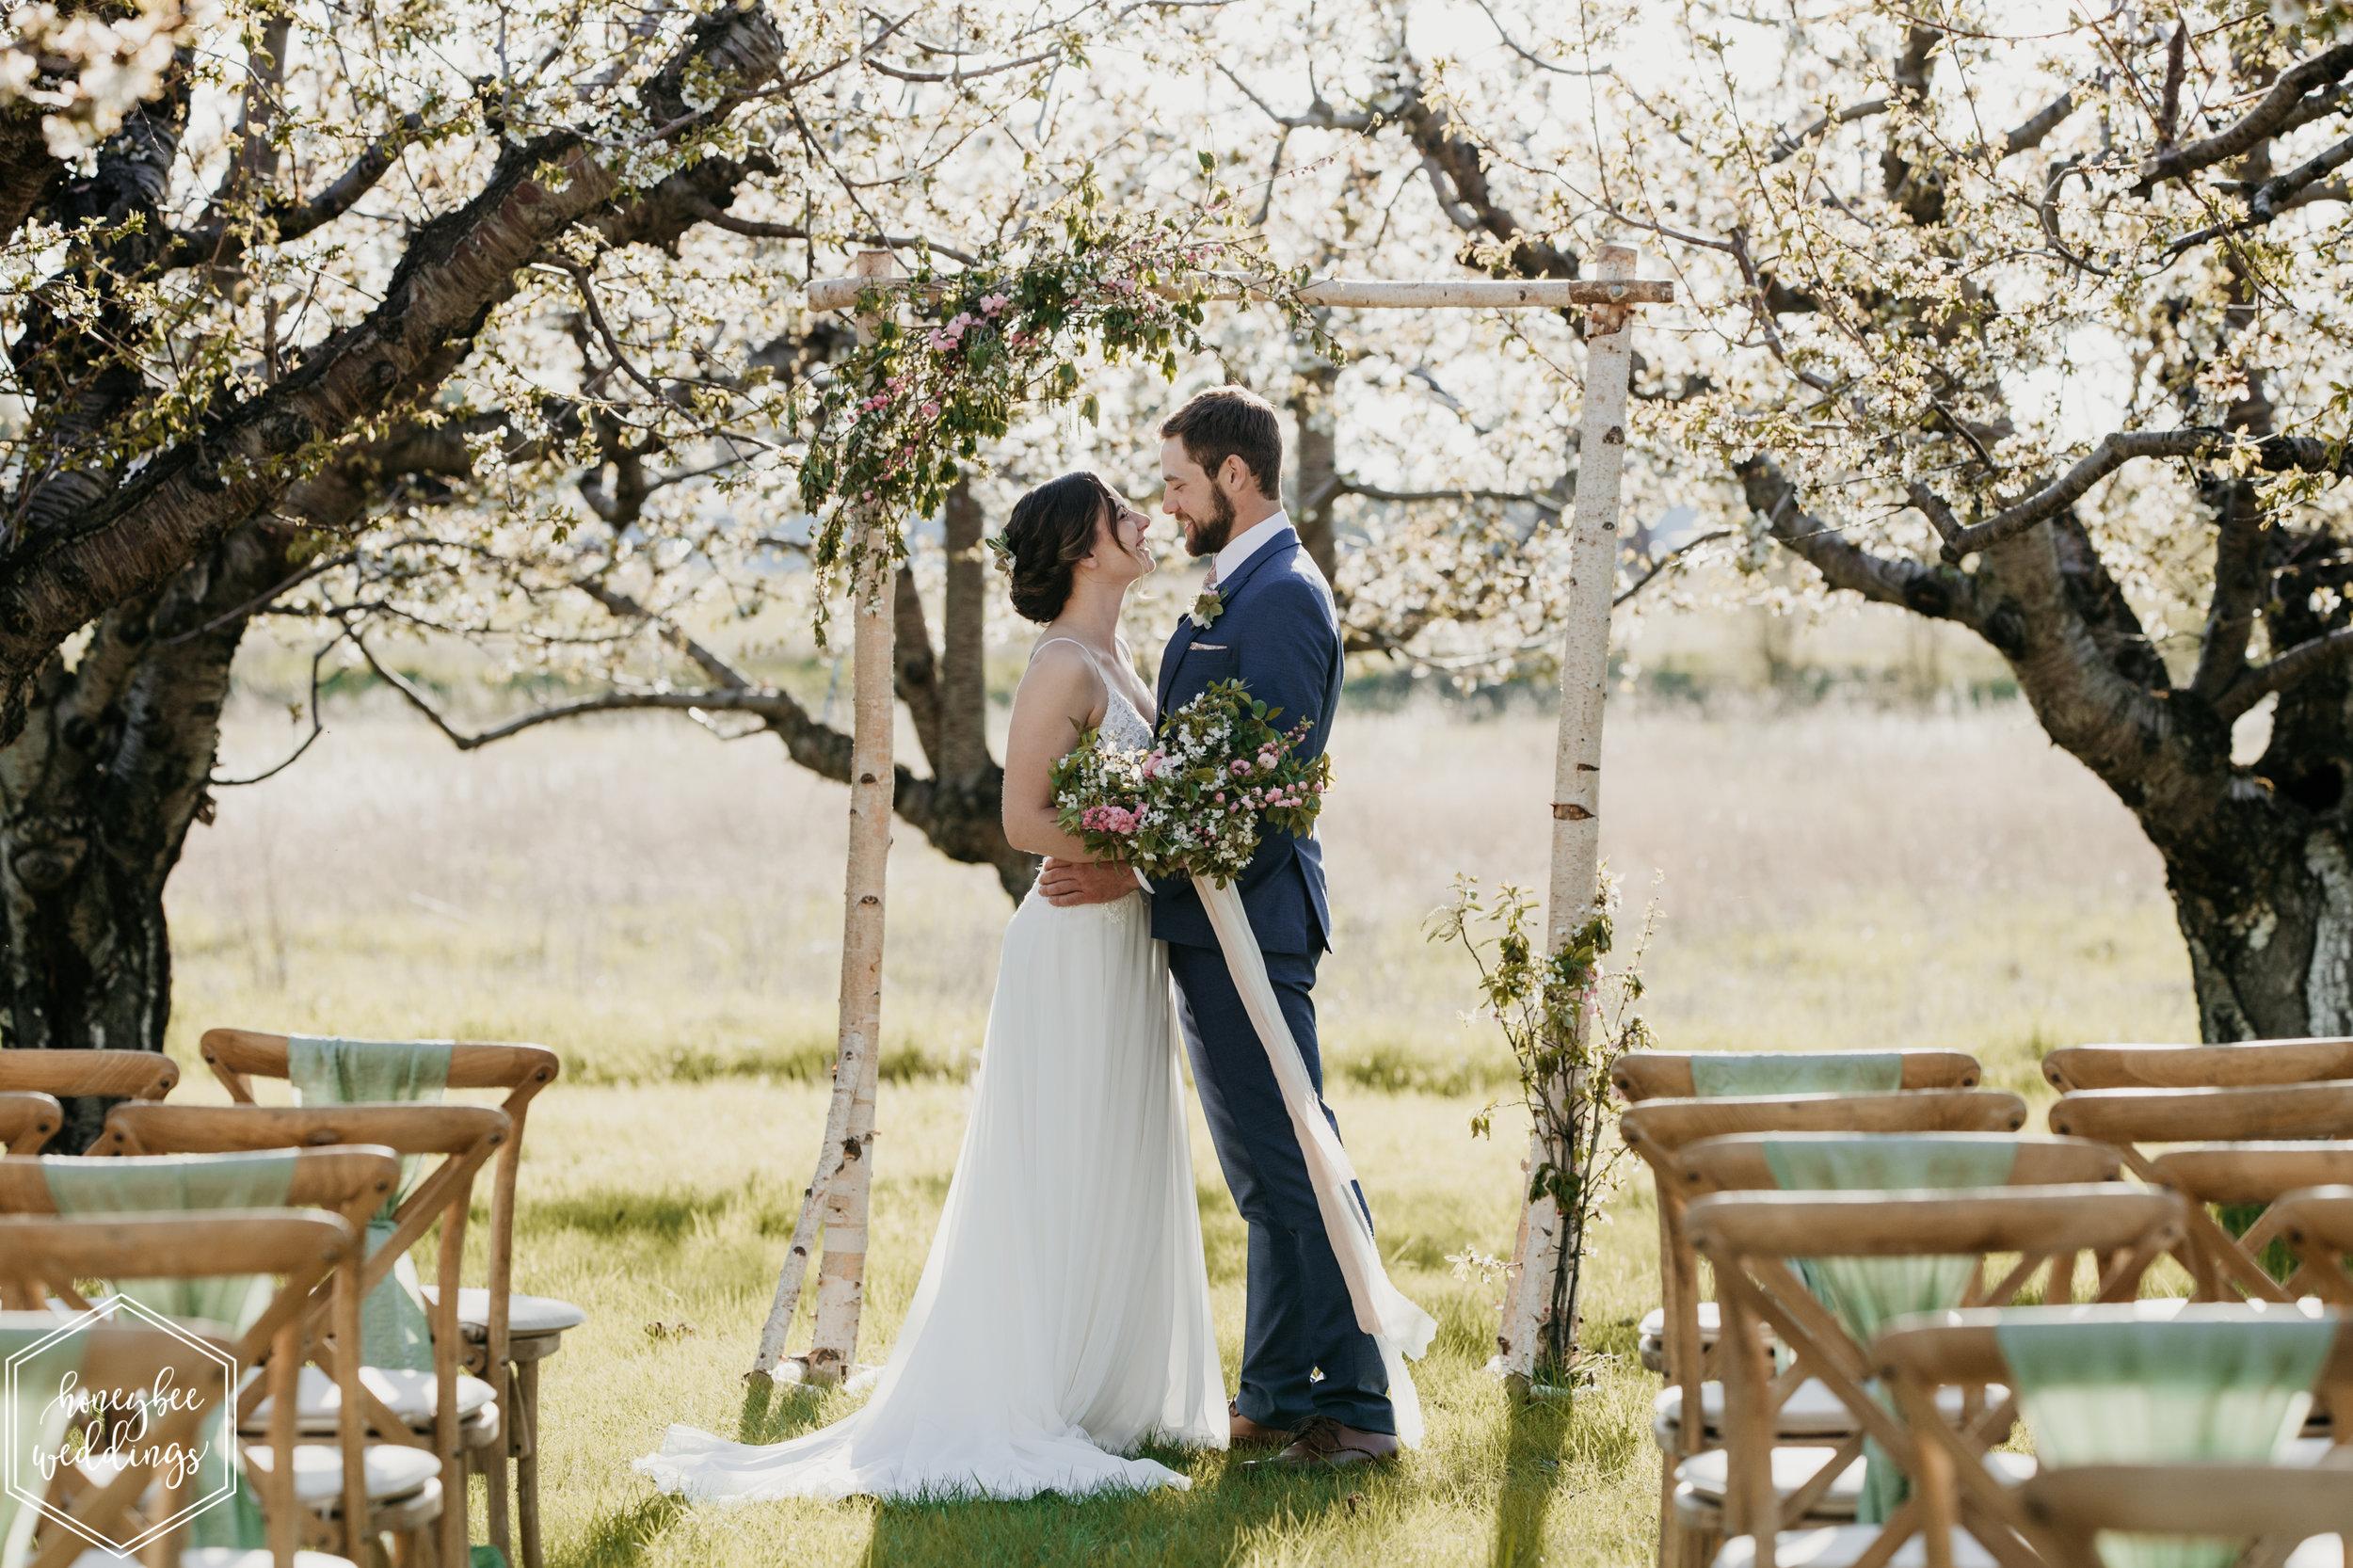 044Cherry Blossom Wedding_Styled Photoshoot_Honeybee Weddings_May 11, 2019-383.jpg